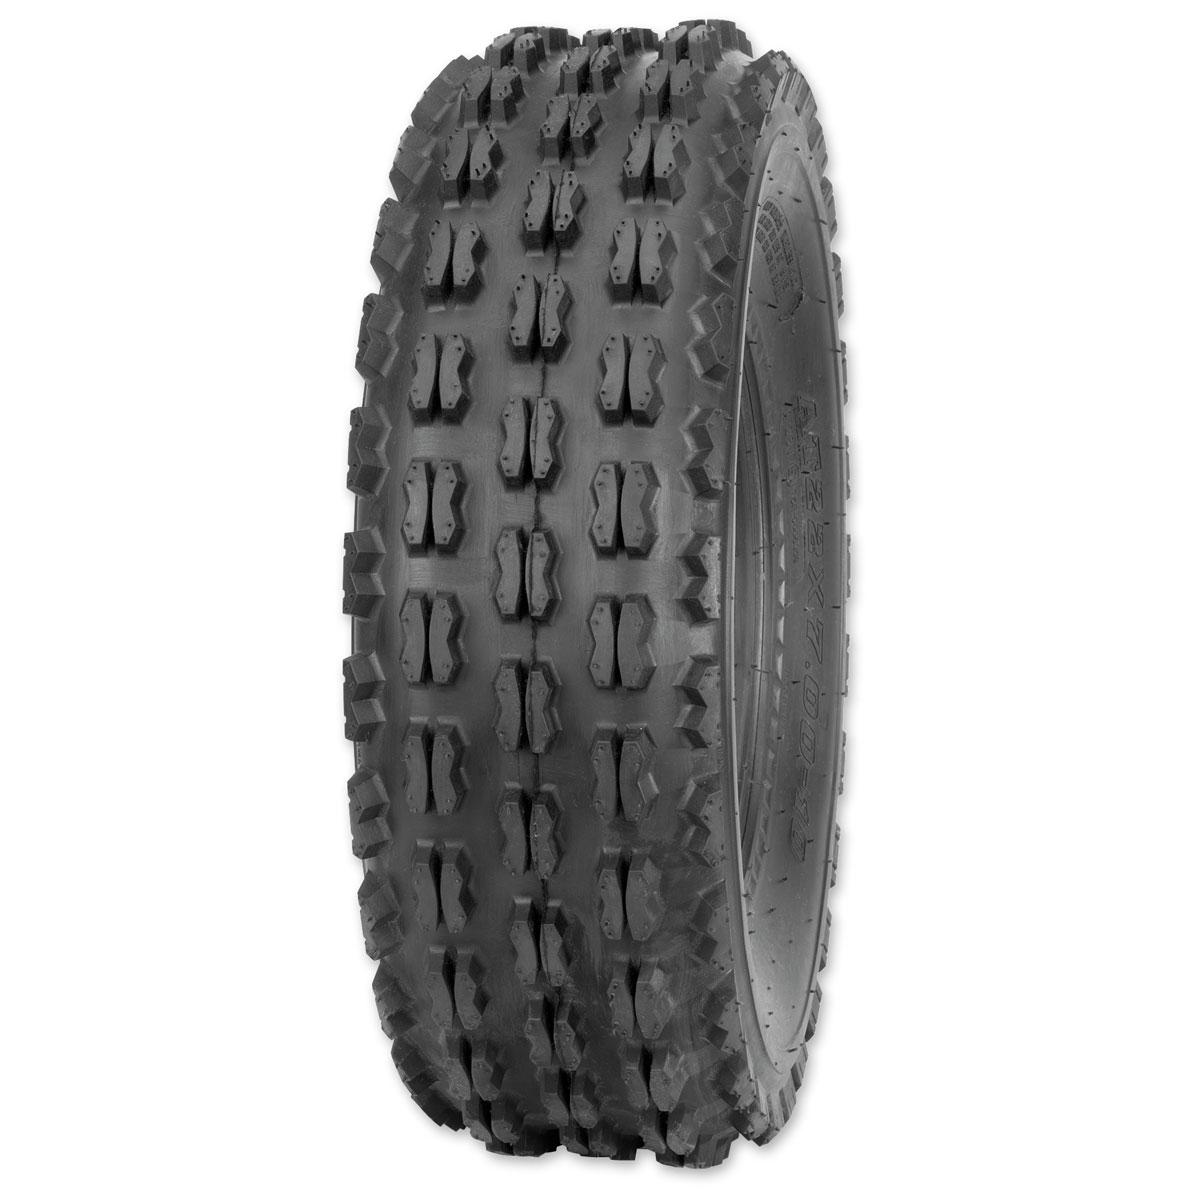 Quadboss QBT738 22X7-10 4PR Front Tire